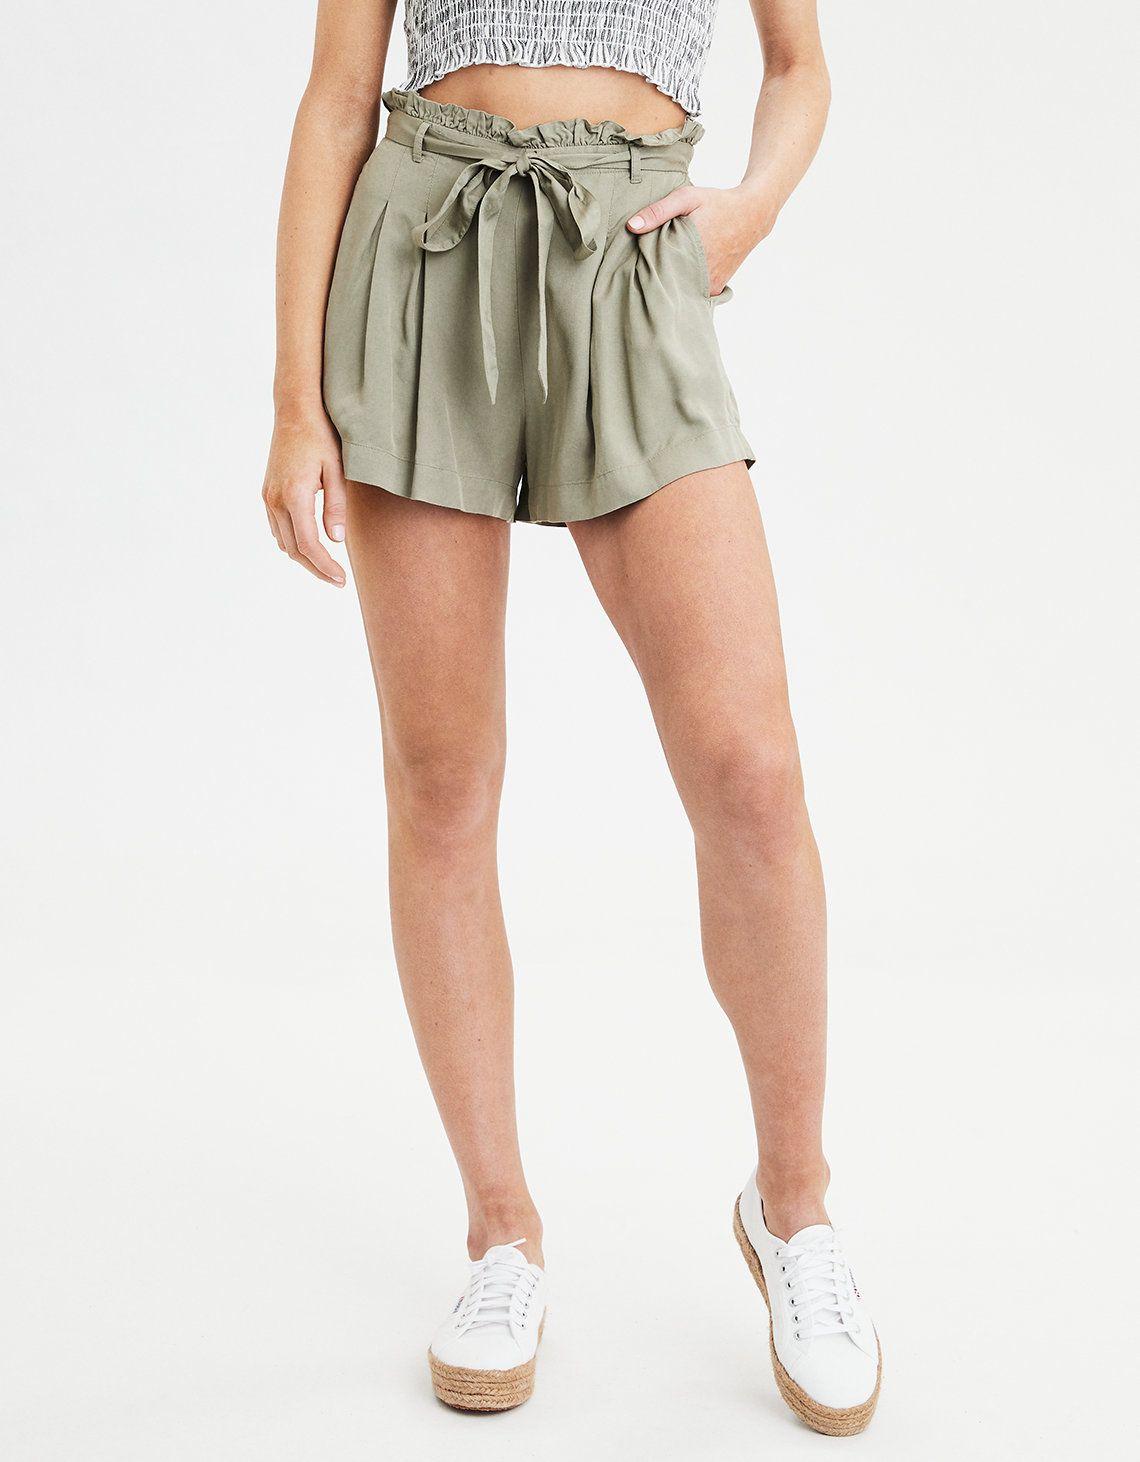 a0e942e715 AE Plaid Paperbag Short in 2019 | AE | Gym shorts womens, American ...